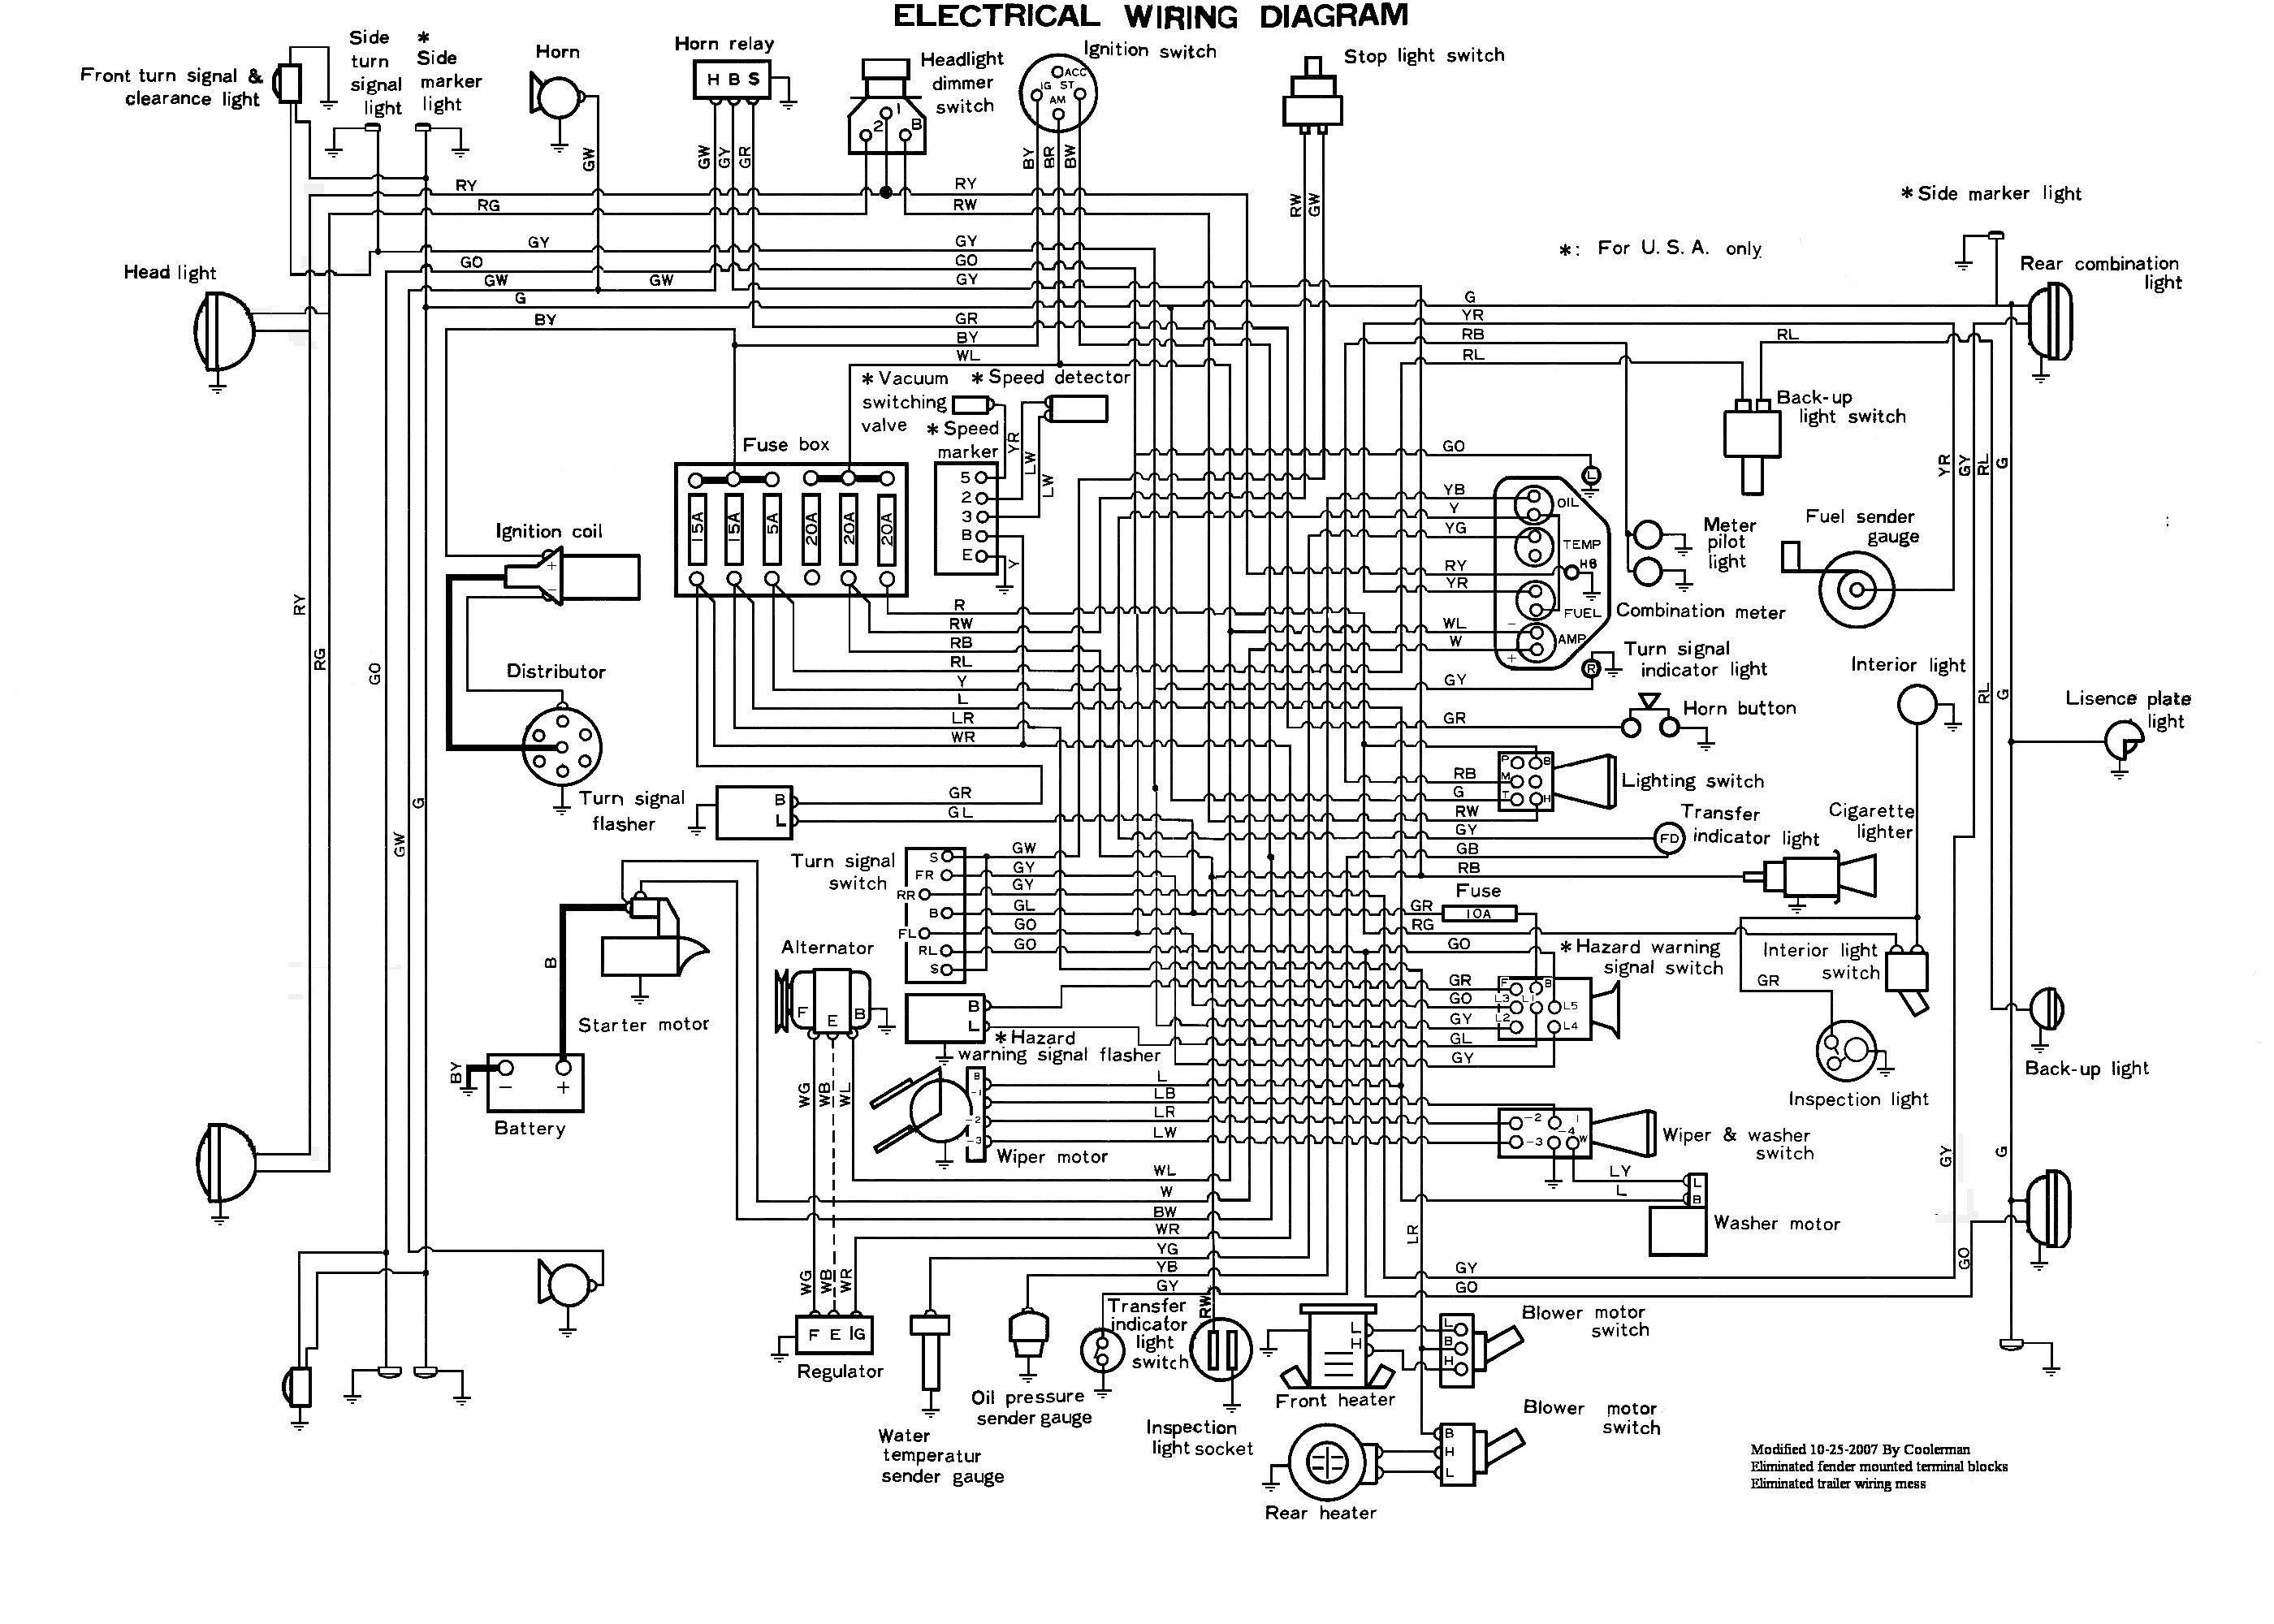 el_1934] wiring diagram 85 fj60 download diagram  alia onica knie dict vira mohammedshrine librar wiring 101